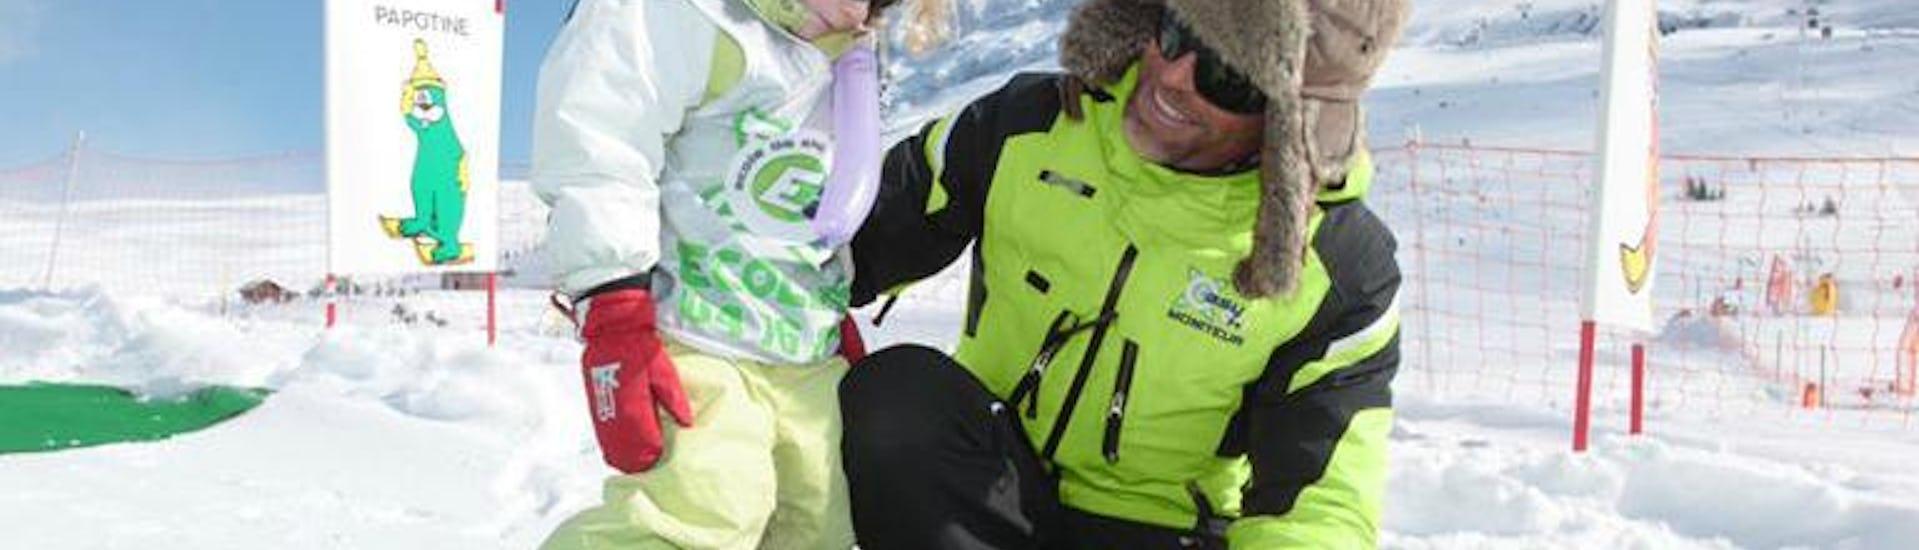 "Kids Ski Lessons ""Baby Club"" (2½-4 years)"